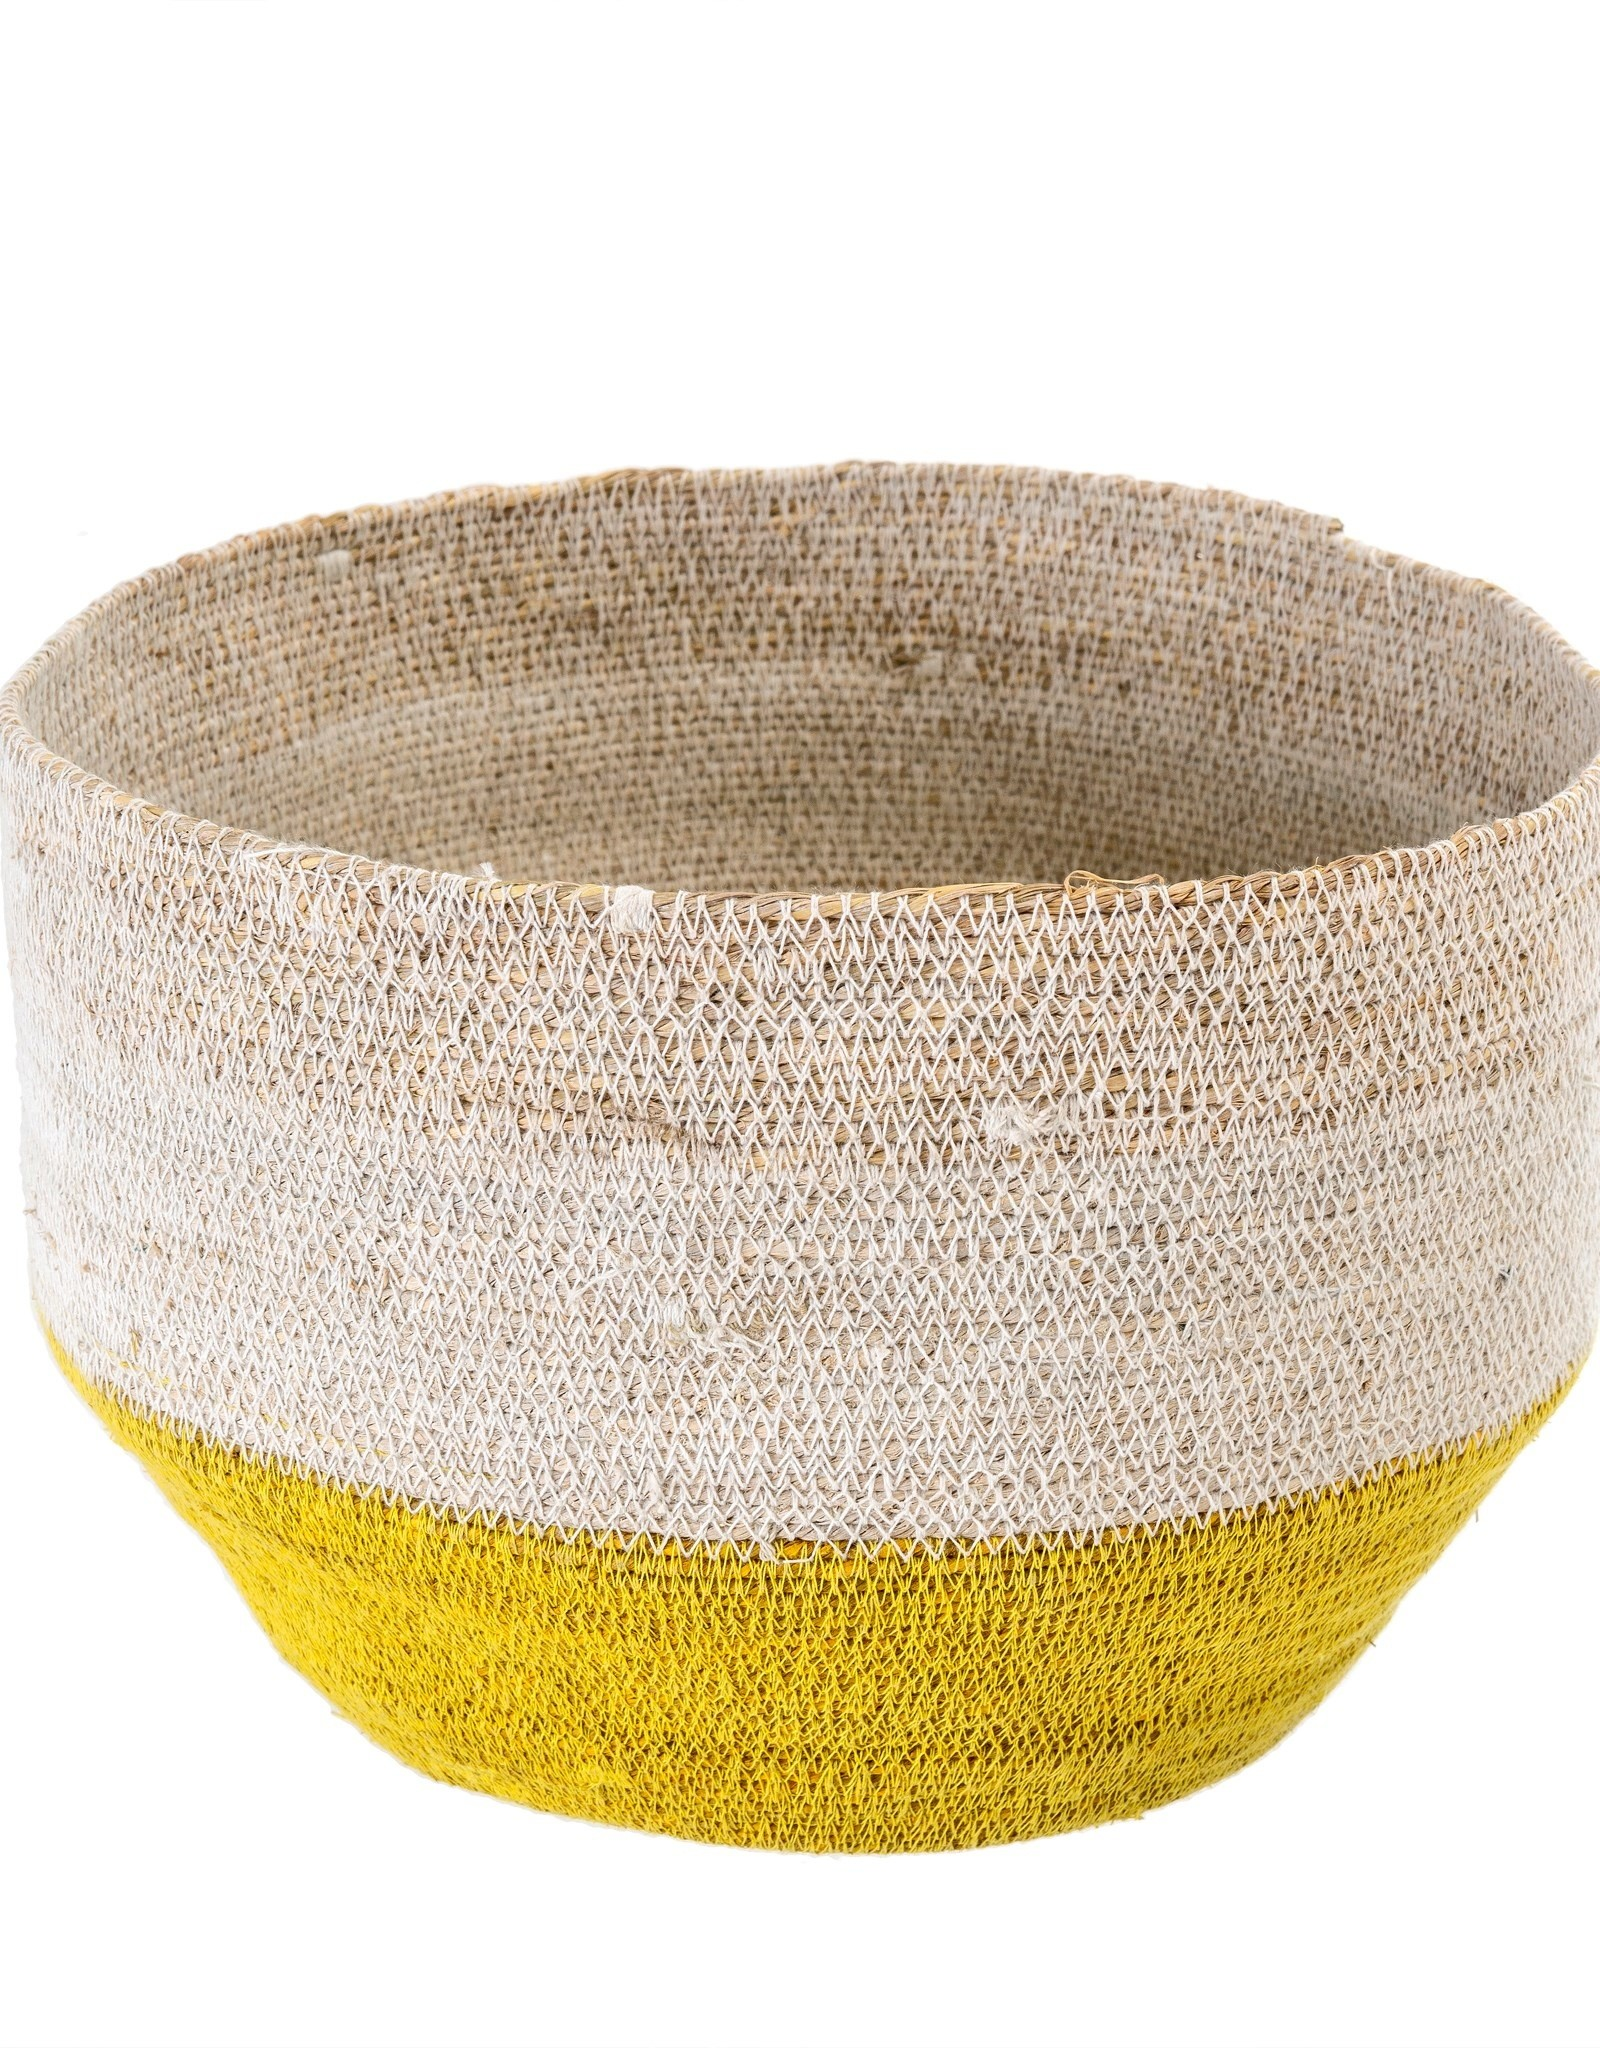 Indaba Basket Indaba Capri Yellow 1-5407